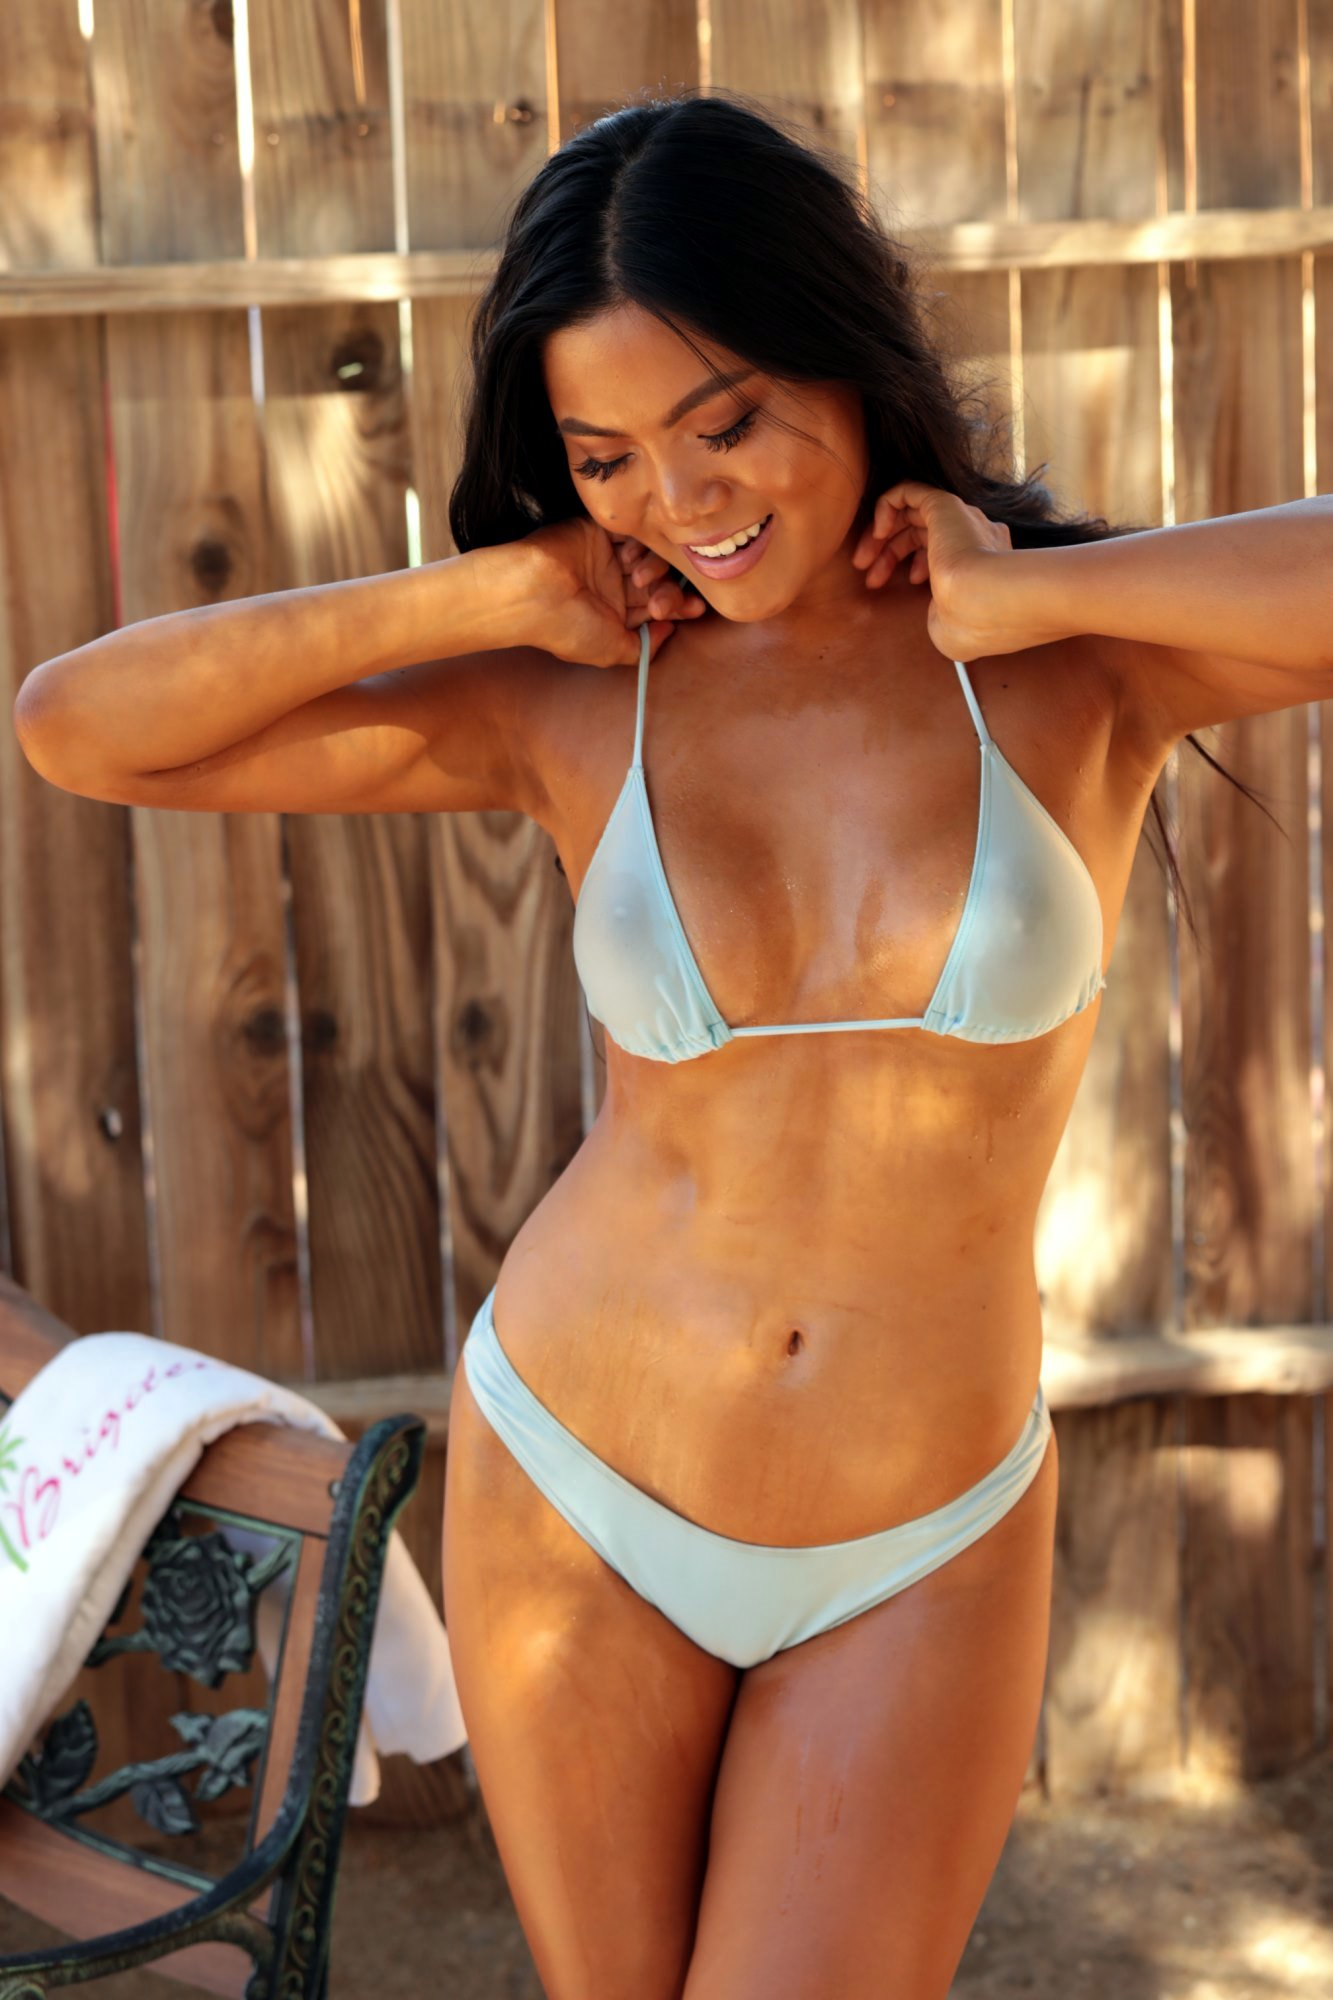 Wet Bikini Pics